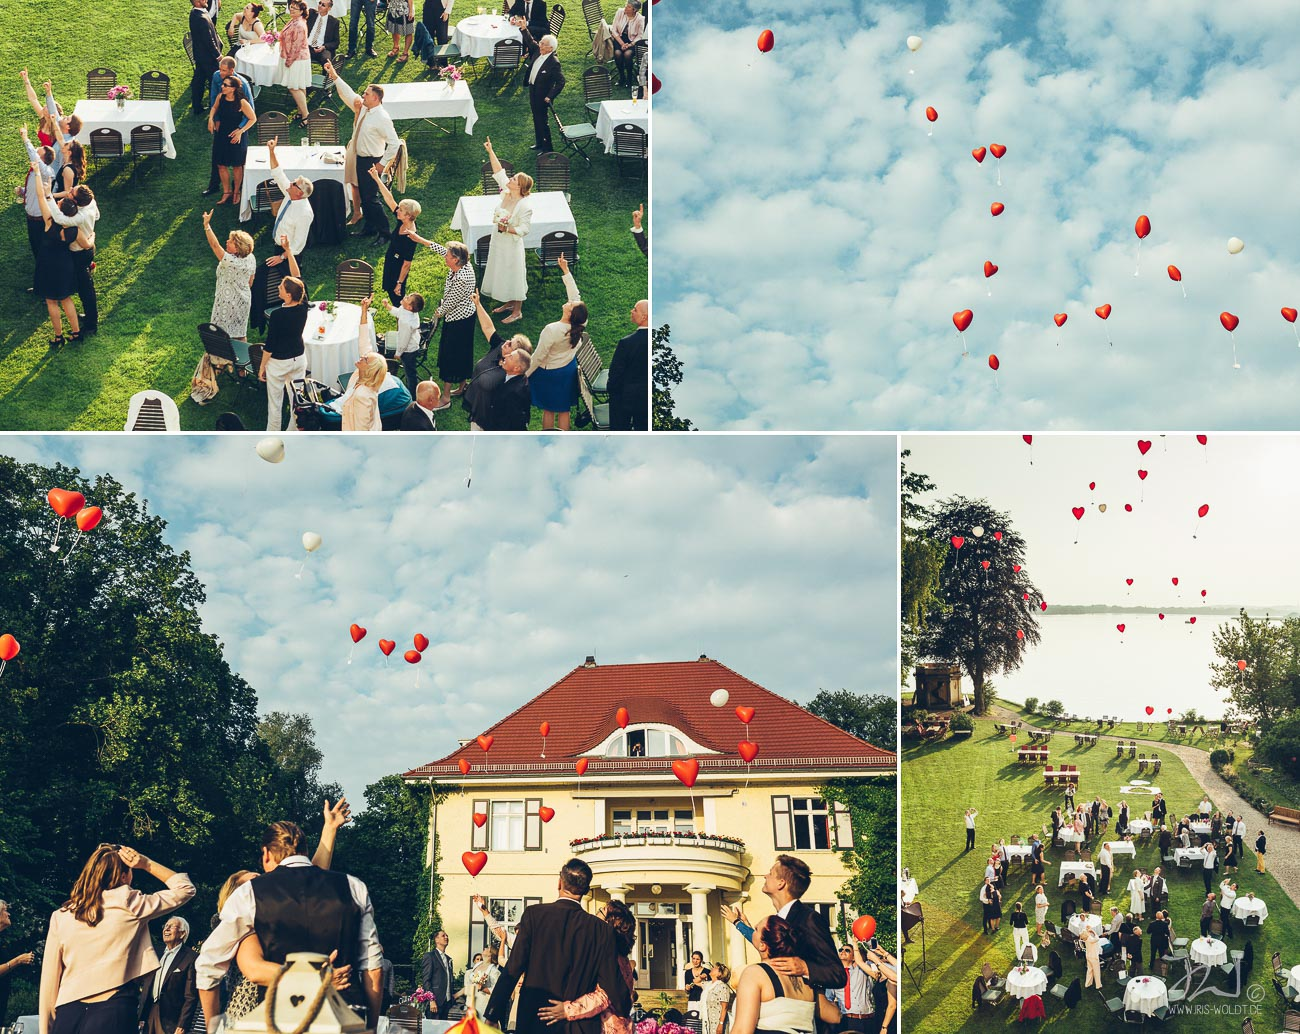 0044_Hochzeitsfotograf_Potsdam_Gut_Schloss_Golm_IrisWoldt45